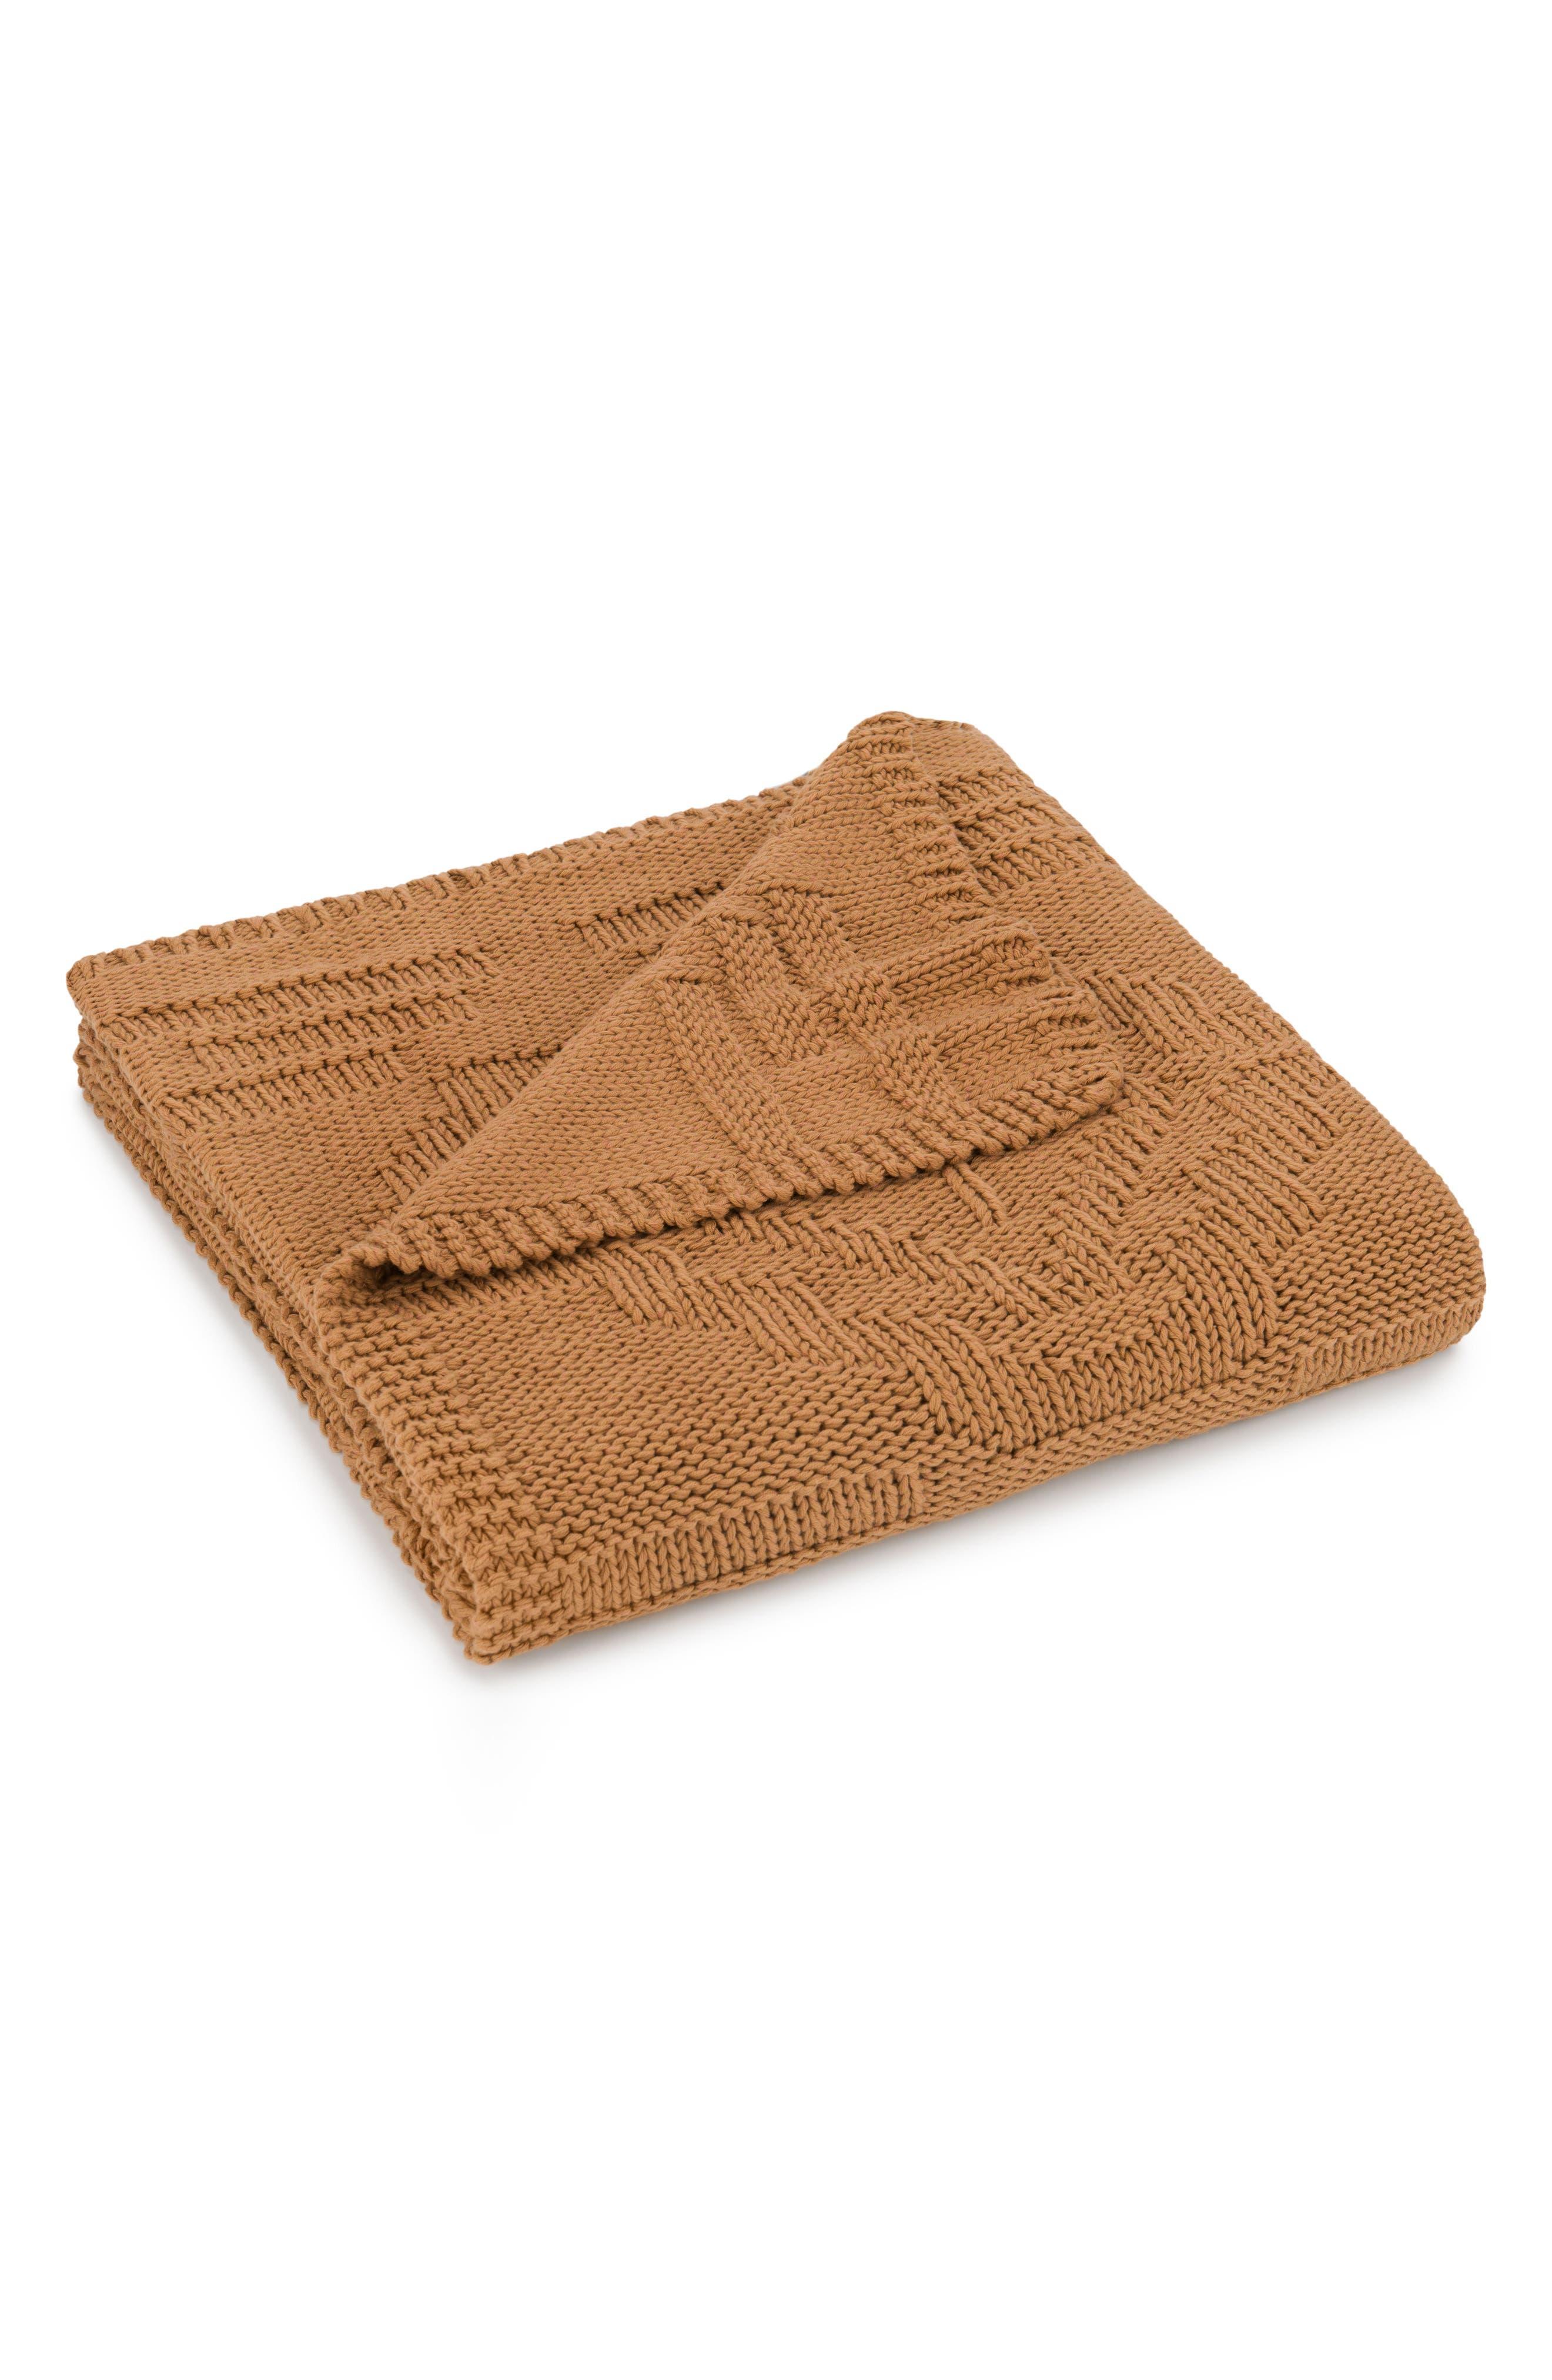 Santa Clara Knit Throw,                         Main,                         color, Cinnamon